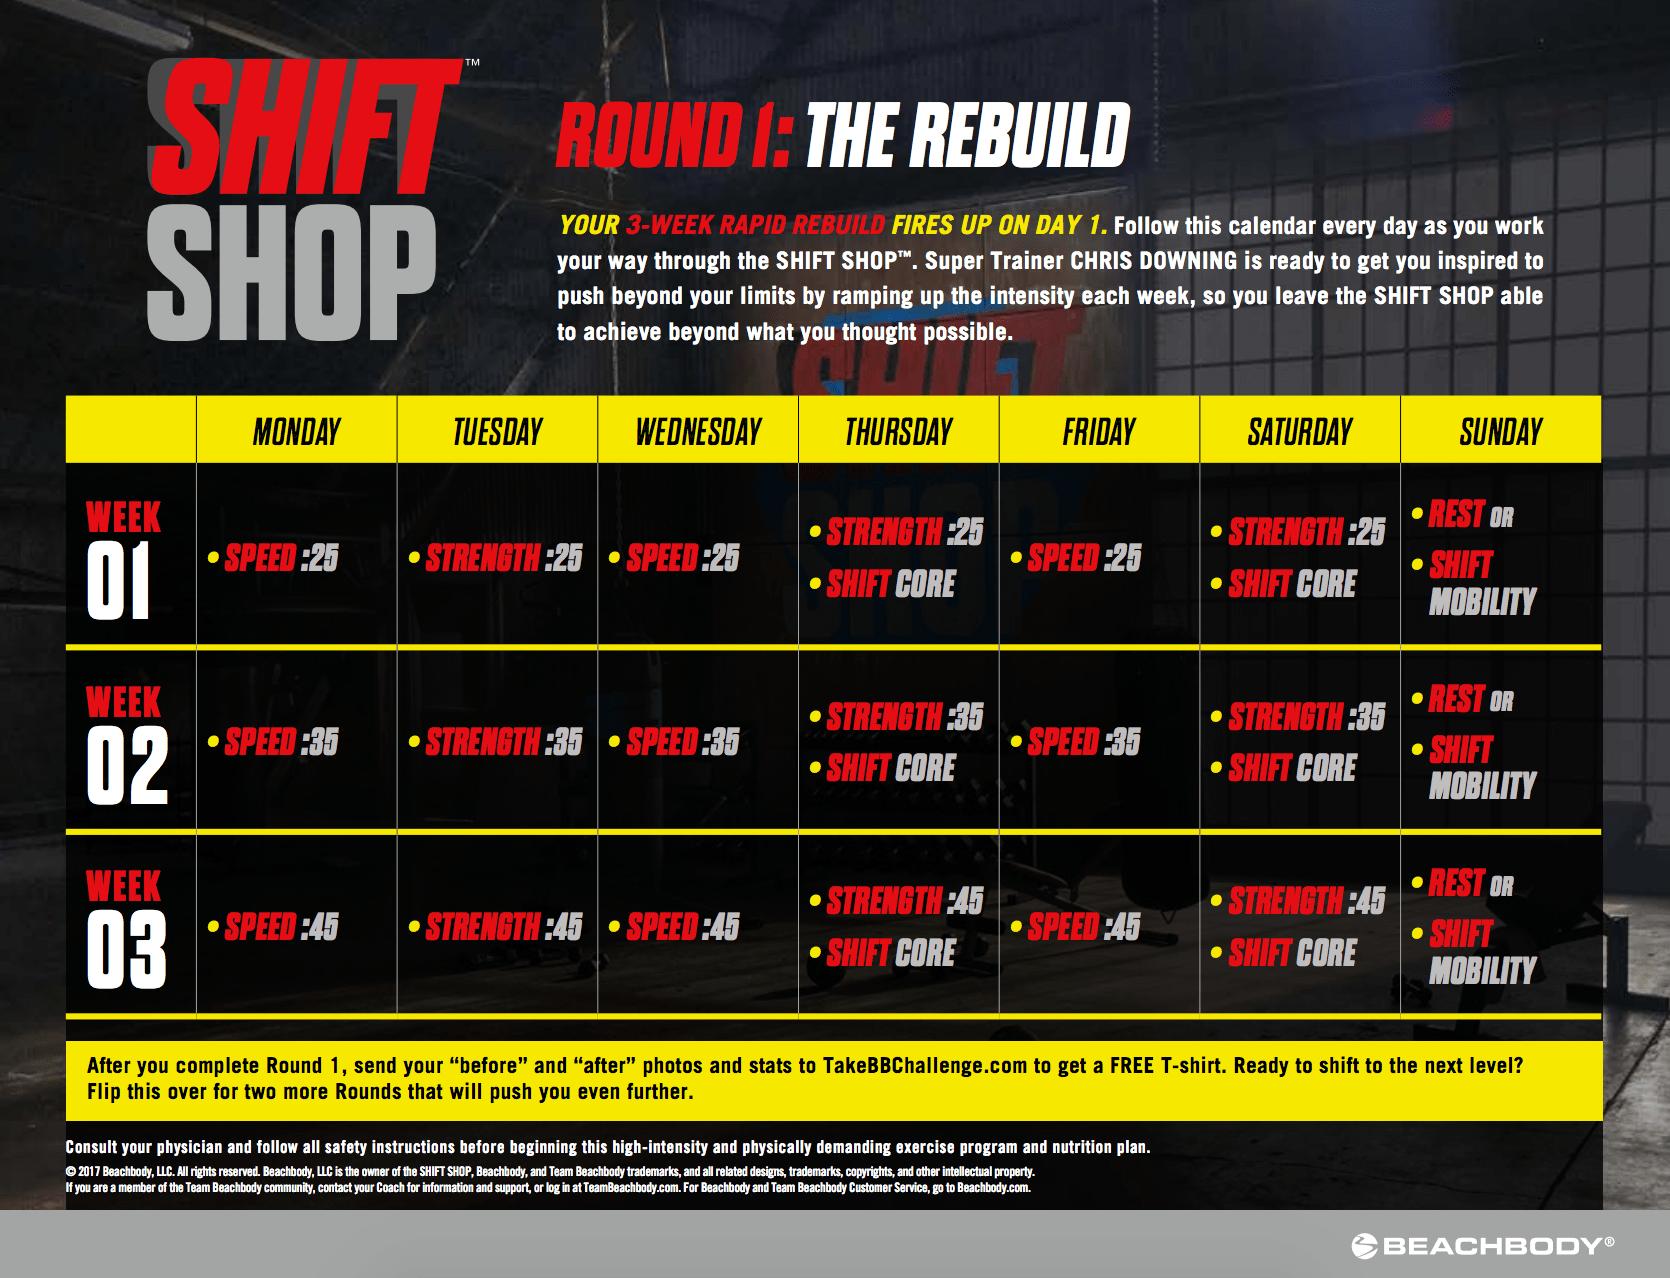 Shift Shop pas de perte de poids Roller perte de poids Arkansas